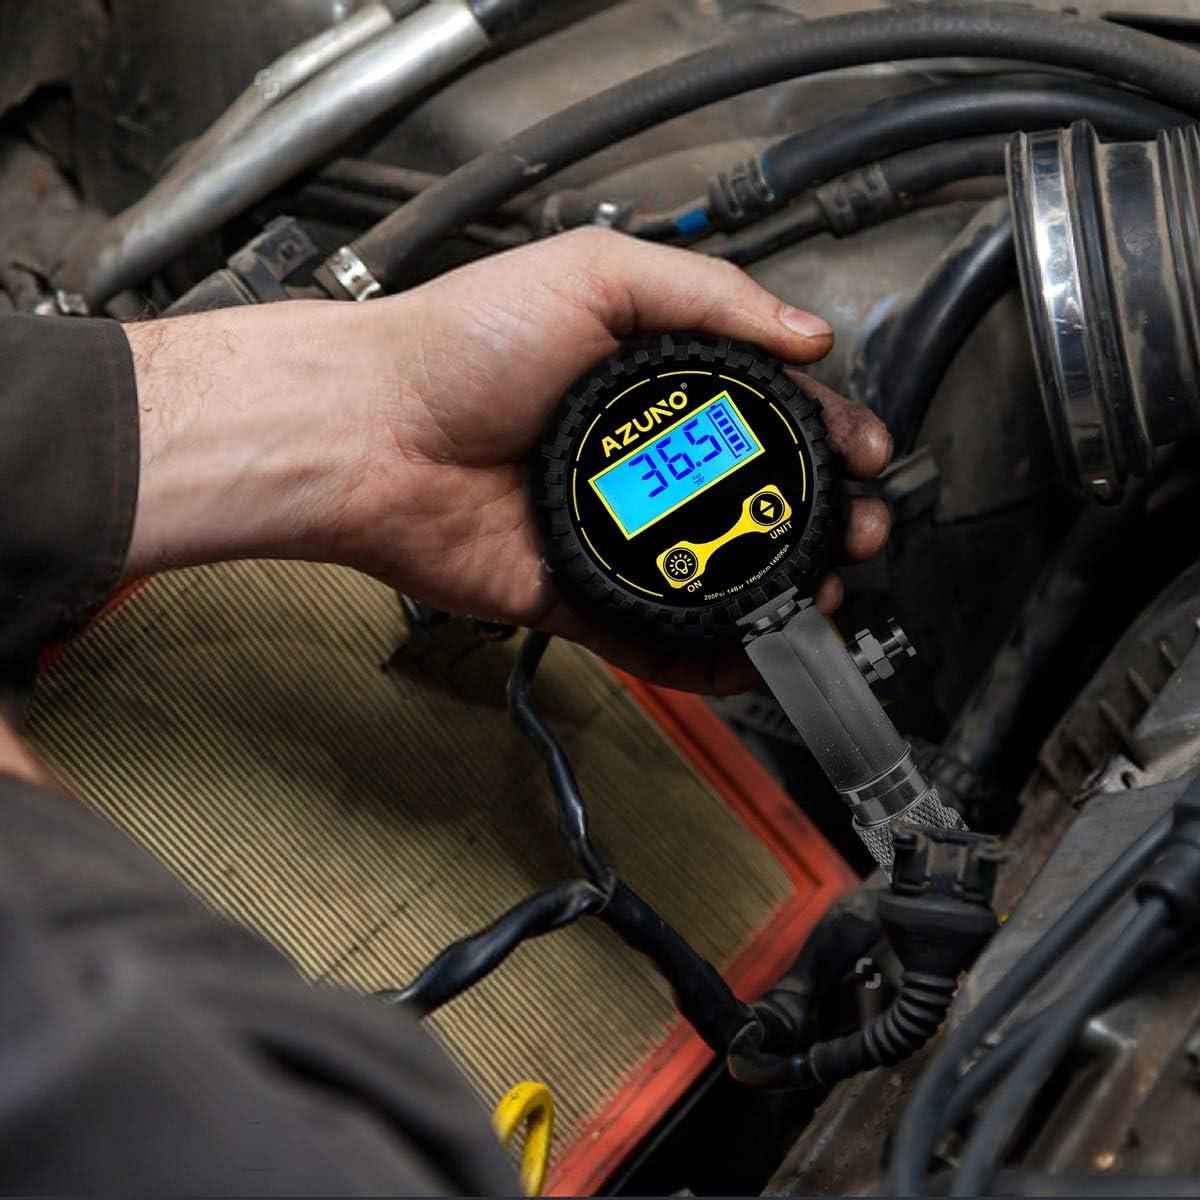 AZUNO Compression Tester Automotive Digital Compression Gauge 200 PSI for Petrol Engine Small Engine Cylinder Compression Tester Kit with Adapter /& Hose